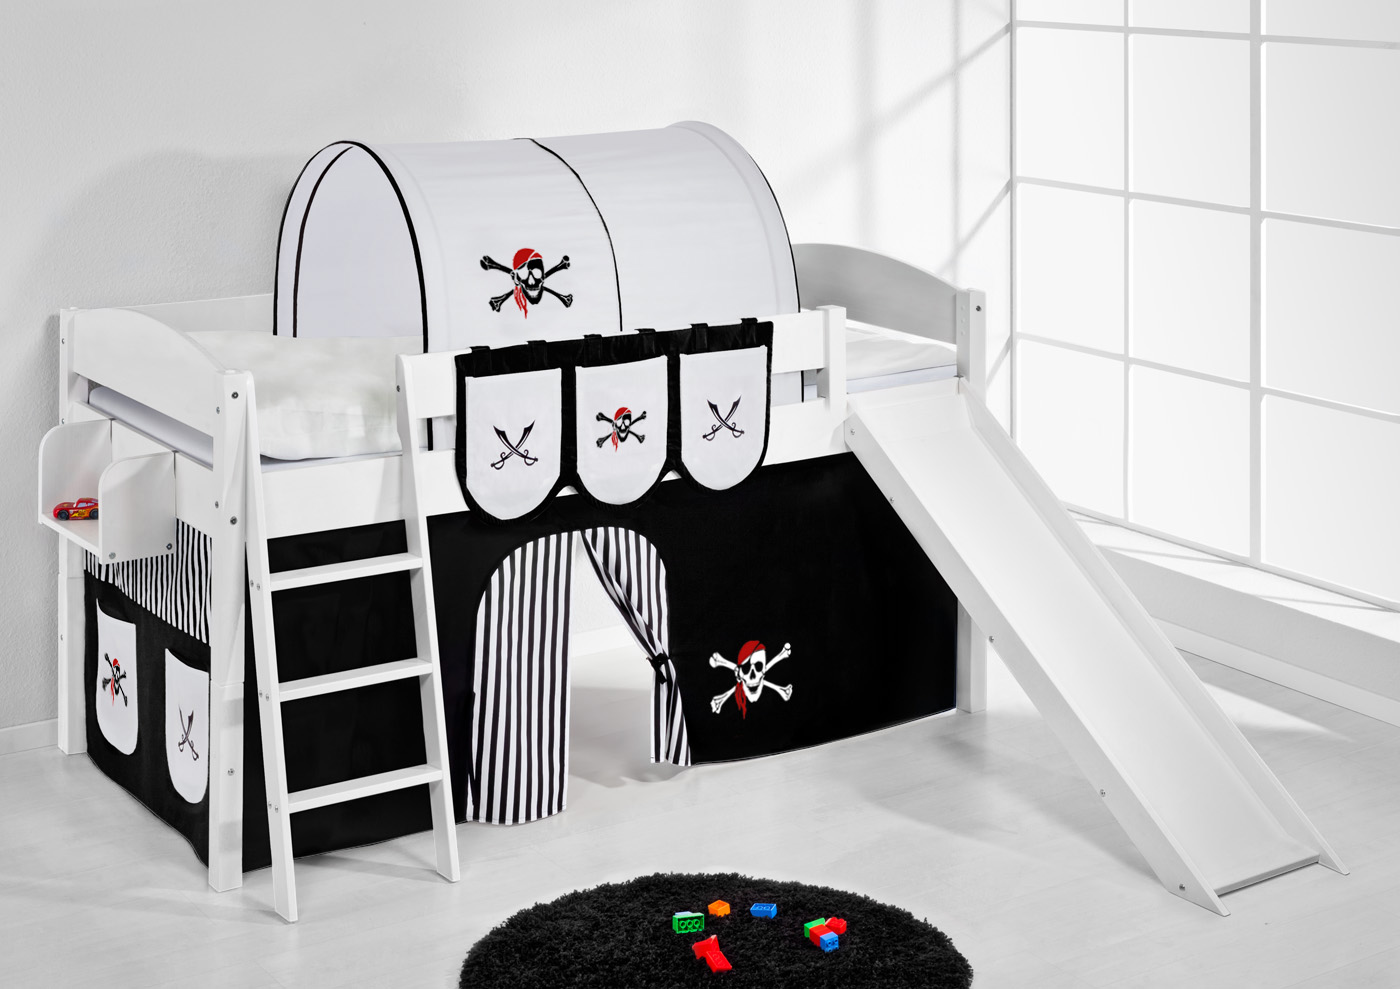 Ikea Expedit Oak Discontinued ~   Hochbett Kinderbett Kinder Bett mit Rutsche umbaubar Einzelbett 4105